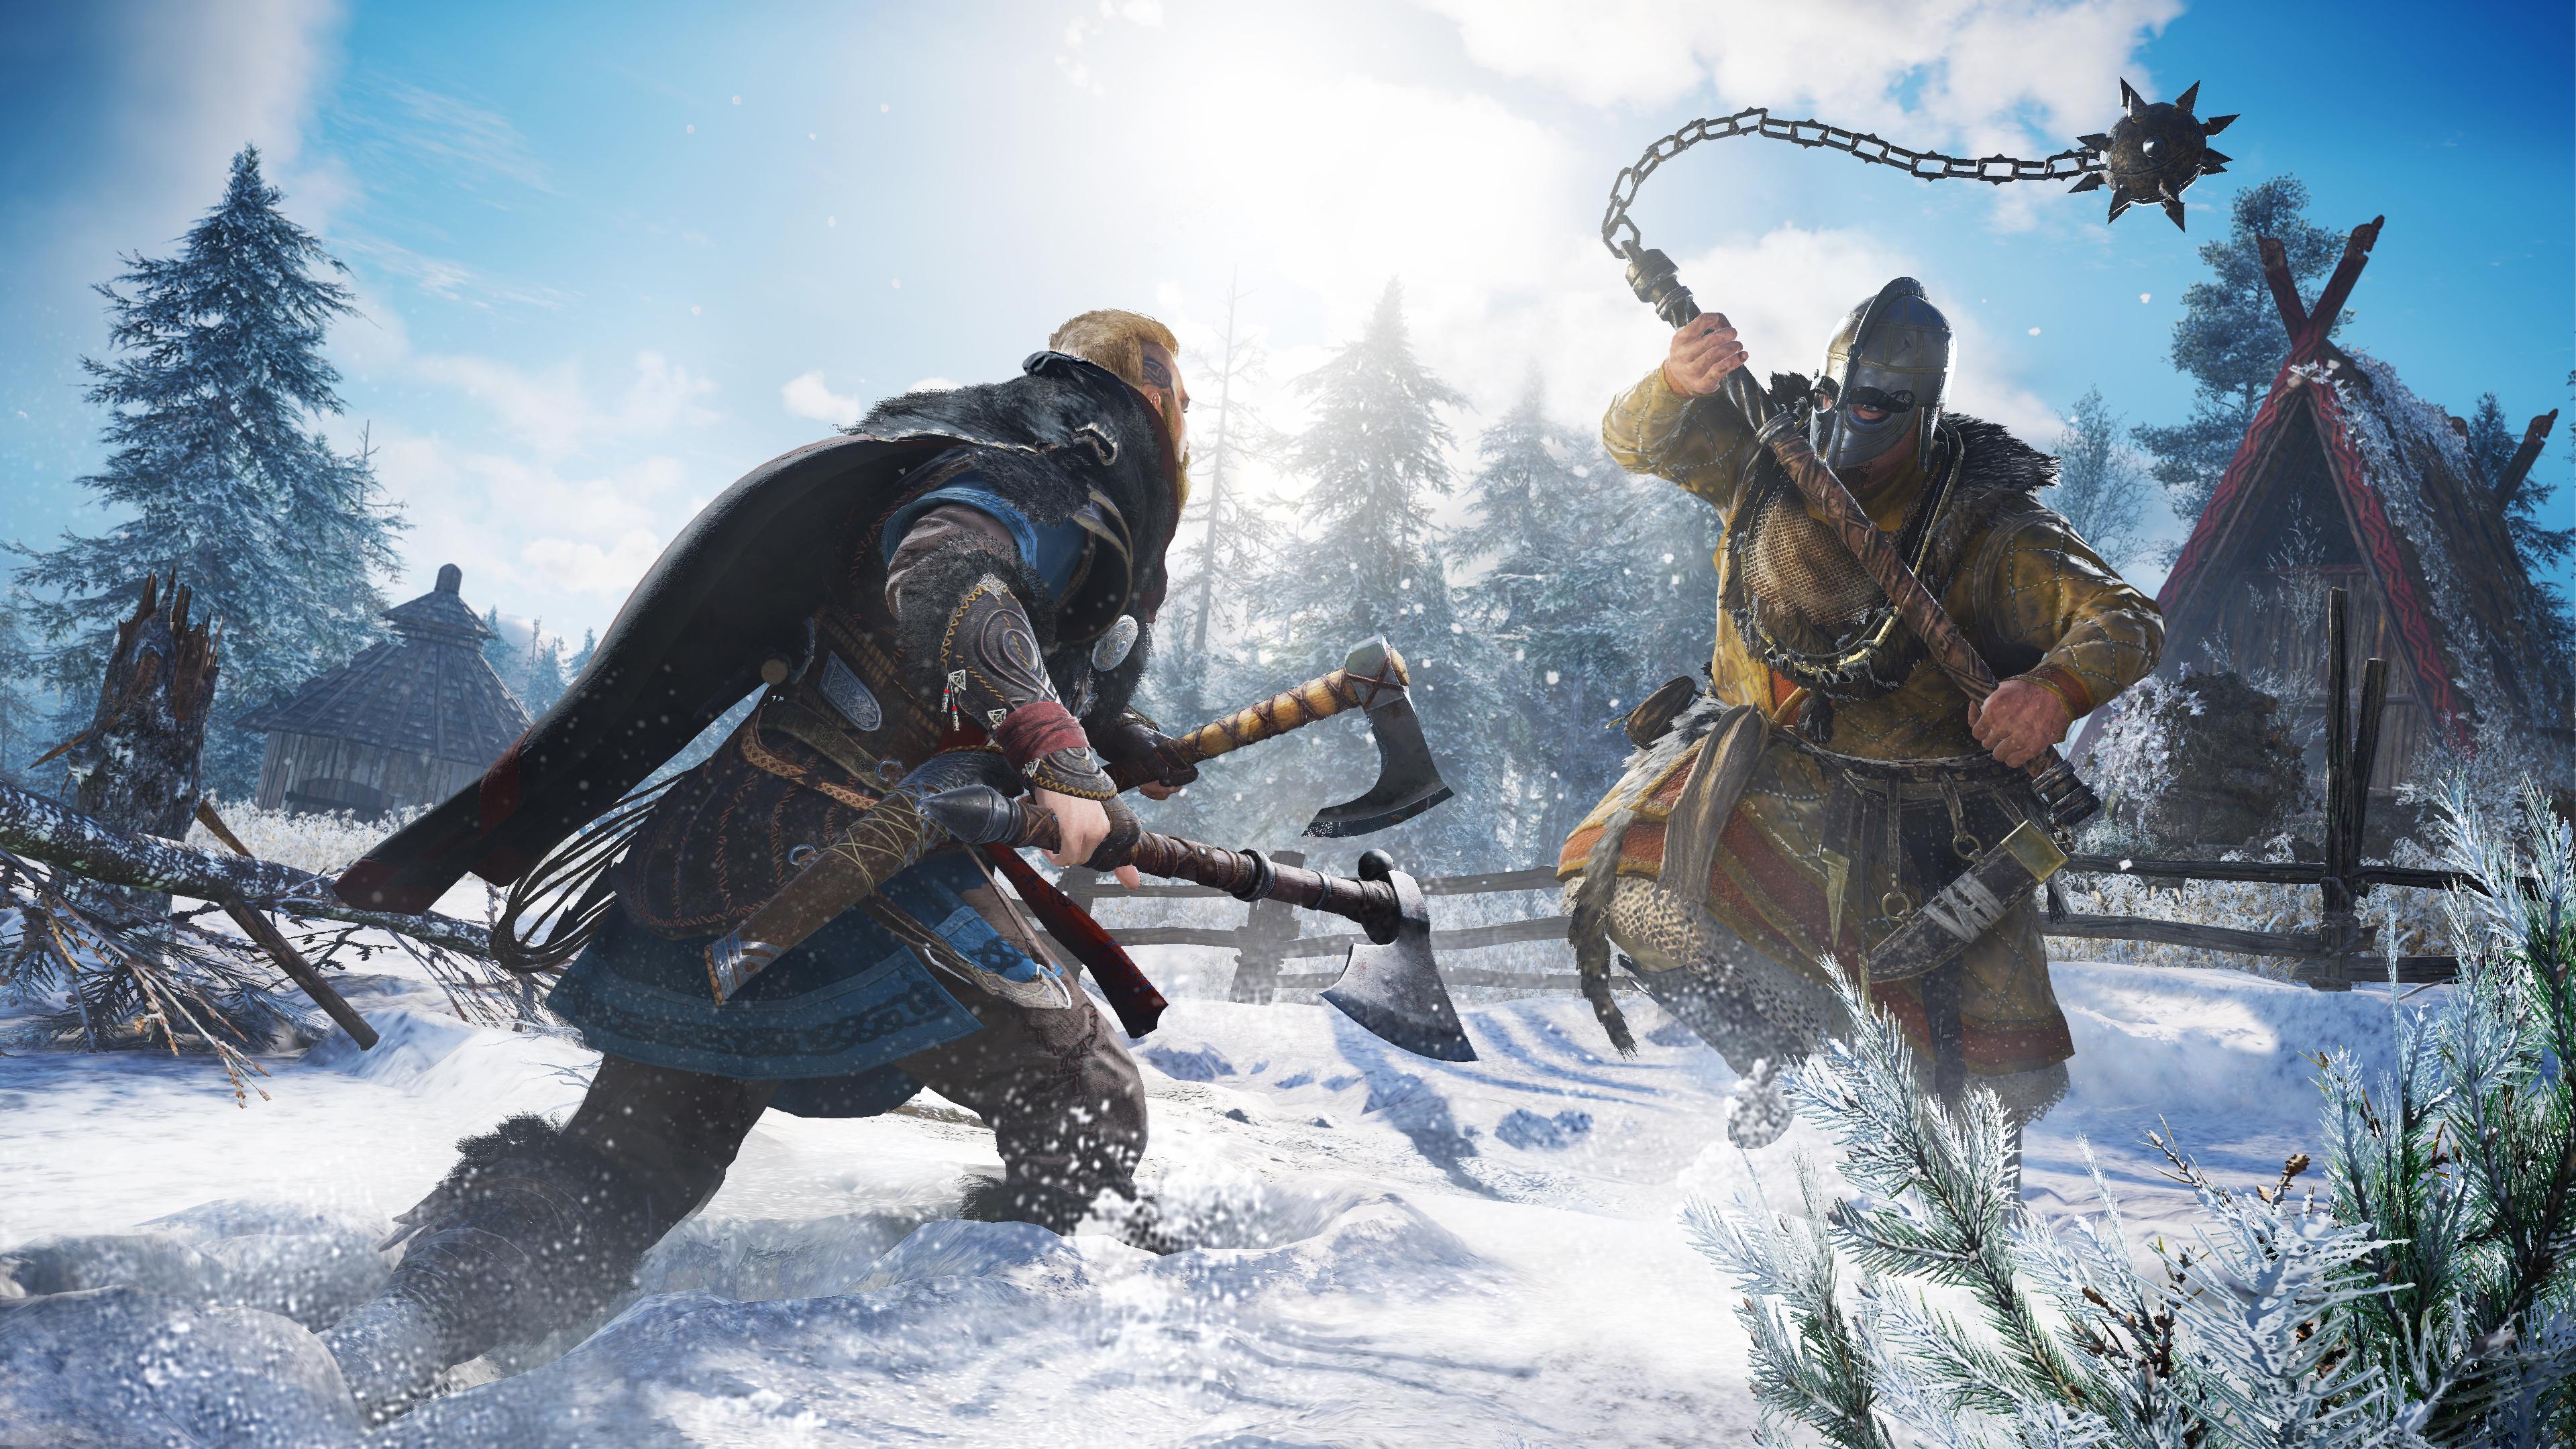 Ubisoft: Assassin's Creed Valhalla будет работать при не менее чем 30 кадрах/с на Xbox Series X